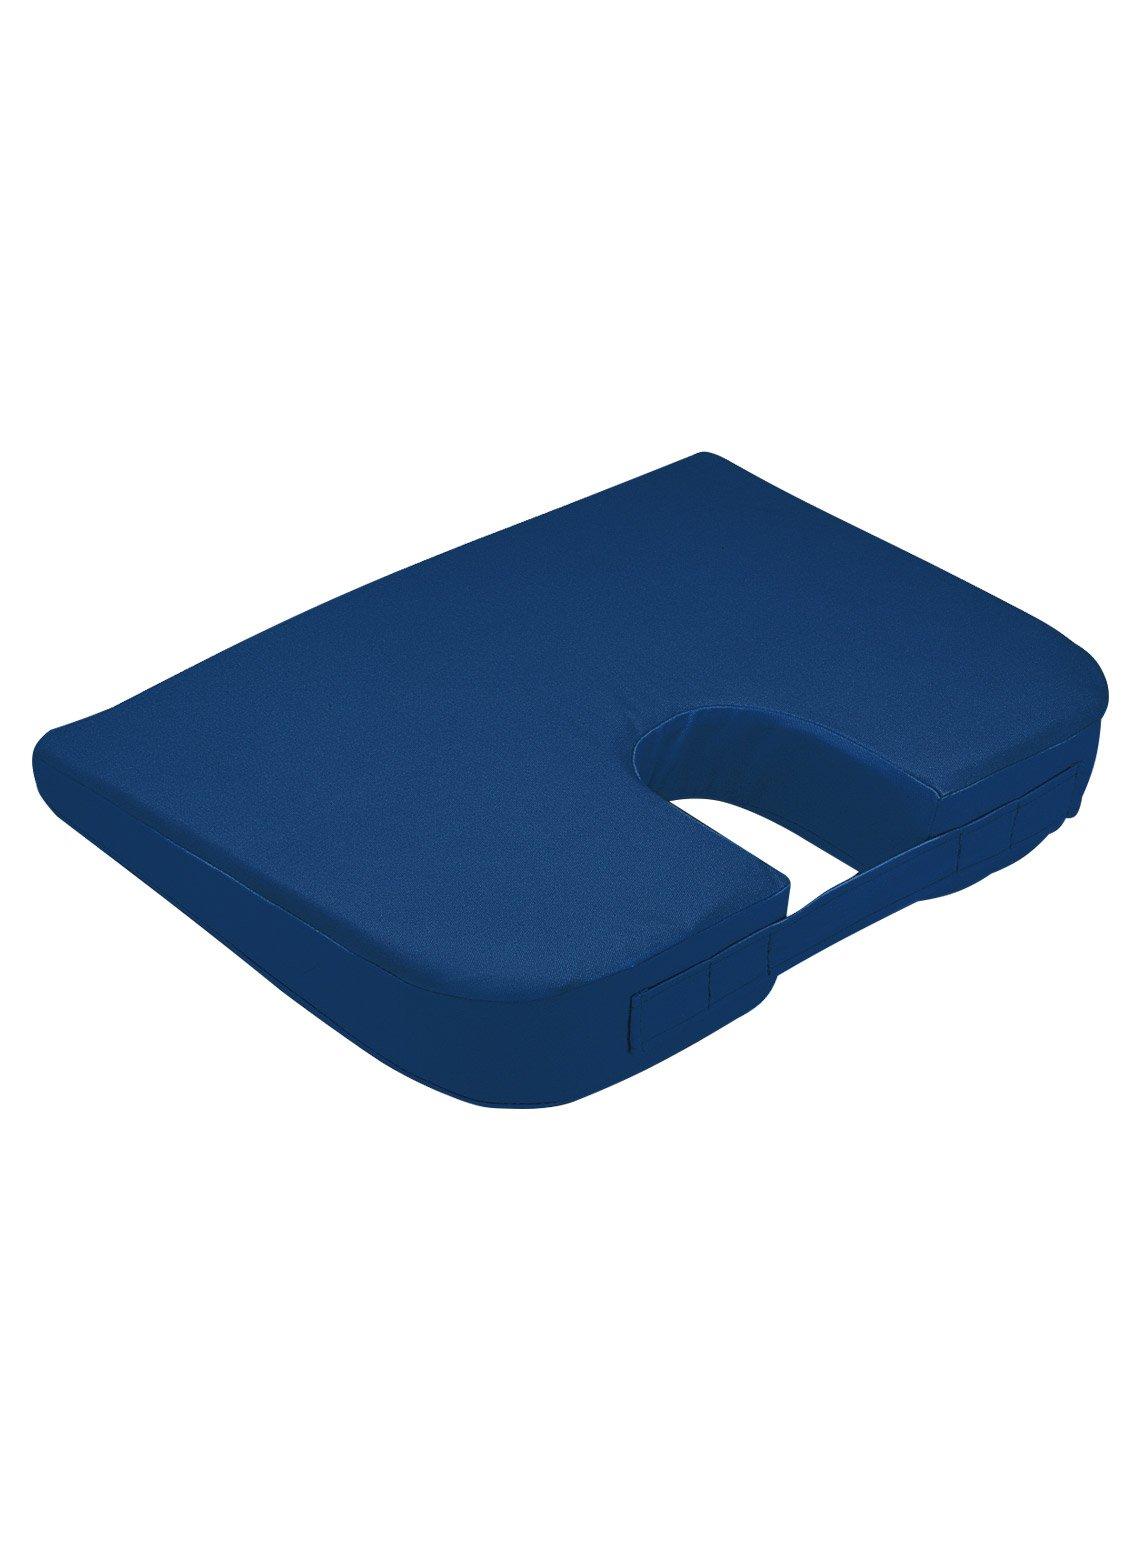 Orthopedic Cushion